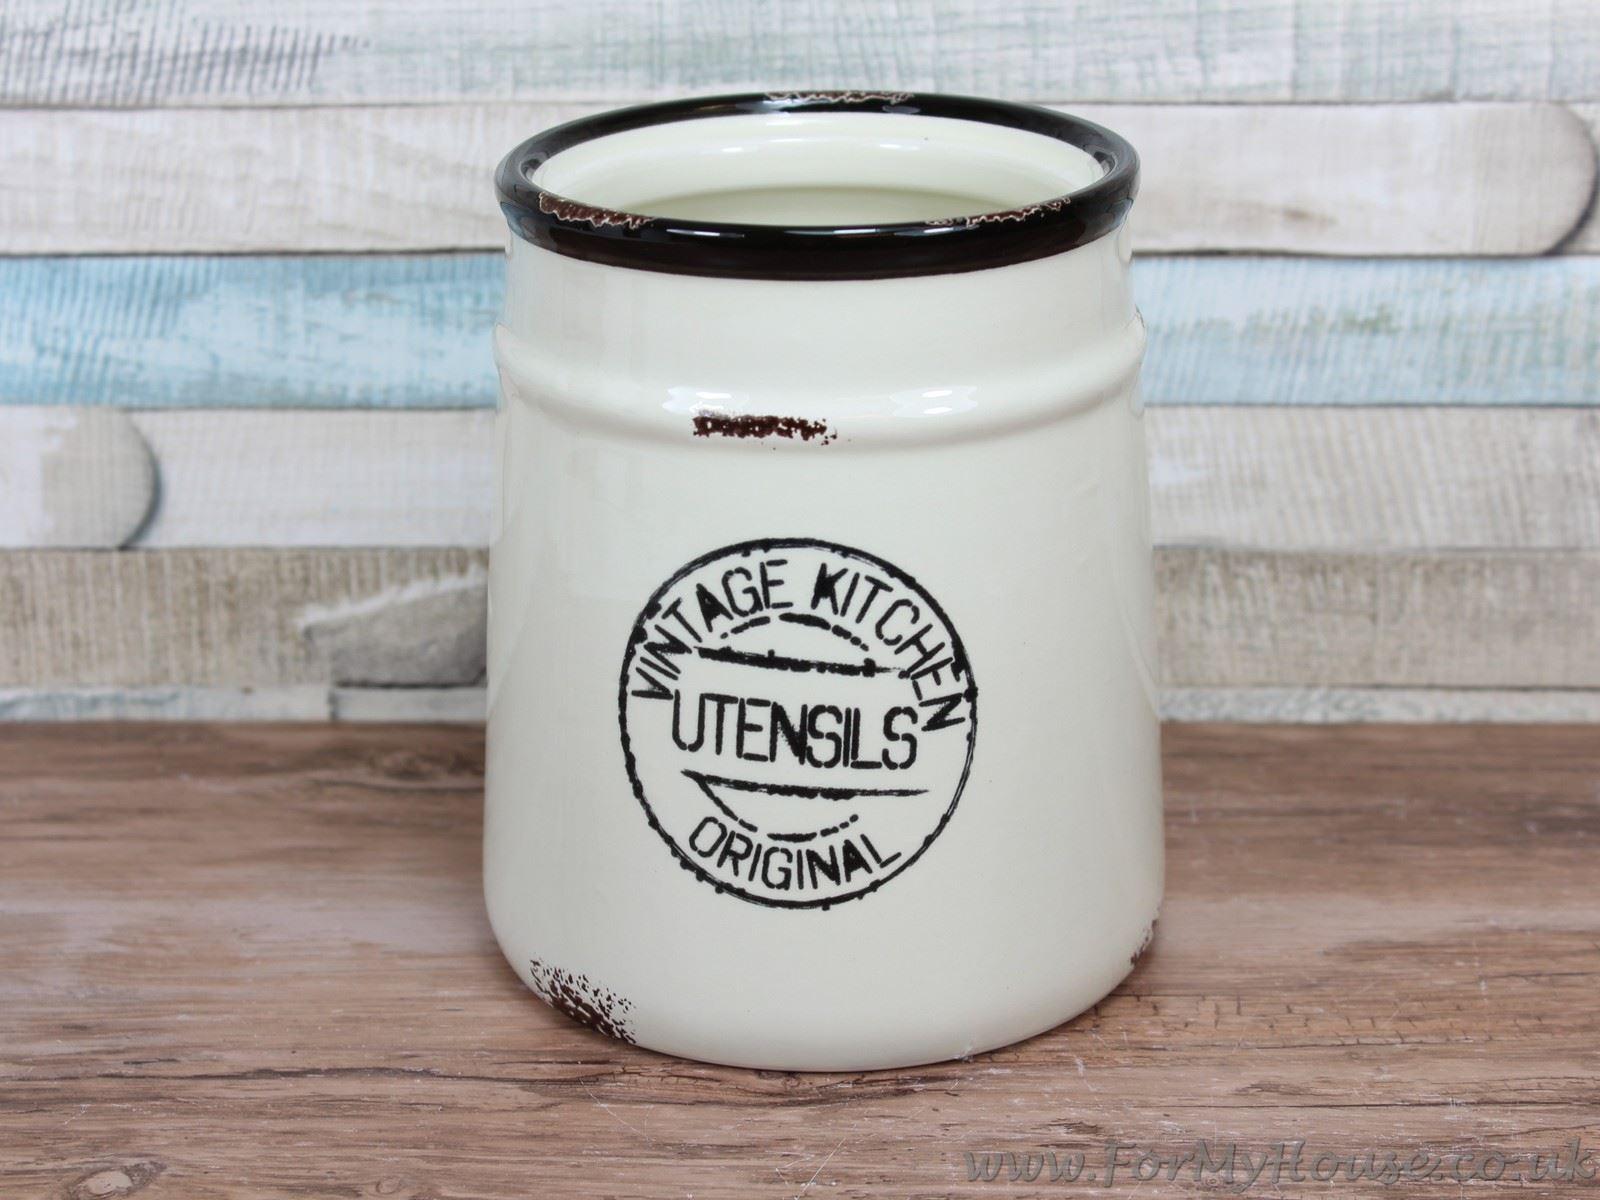 vintage kitchen cream ceramic rustic utensils canister bol com rivi 232 ra maison kitchen utensils canister